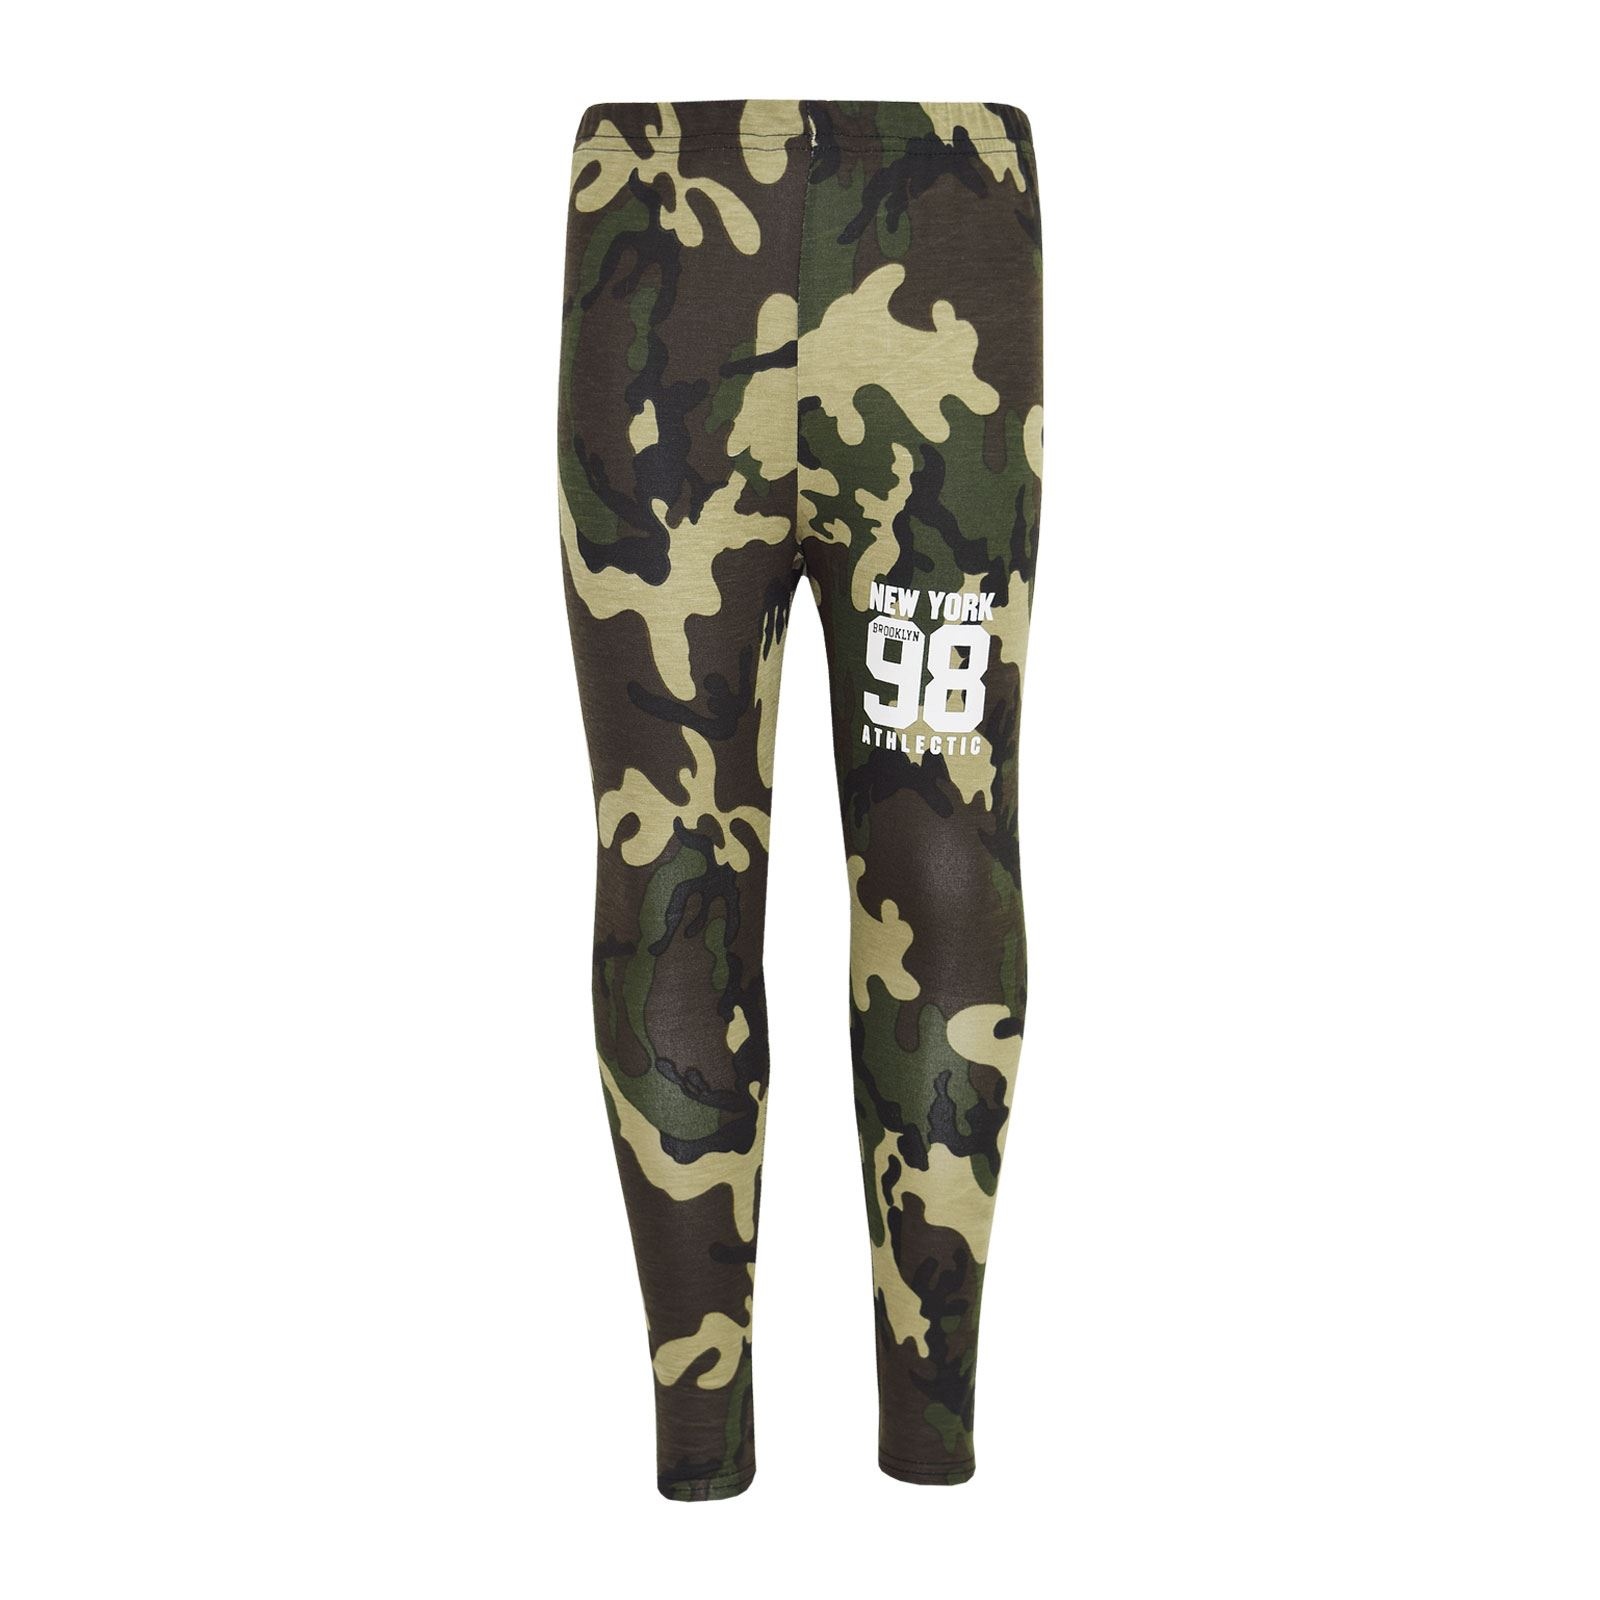 Girls-NEW-YORK-BROOKLYN-98-ATHLECTIC-Camouflage-Print-Top-amp-Legging-Set-7-13-Yr thumbnail 20